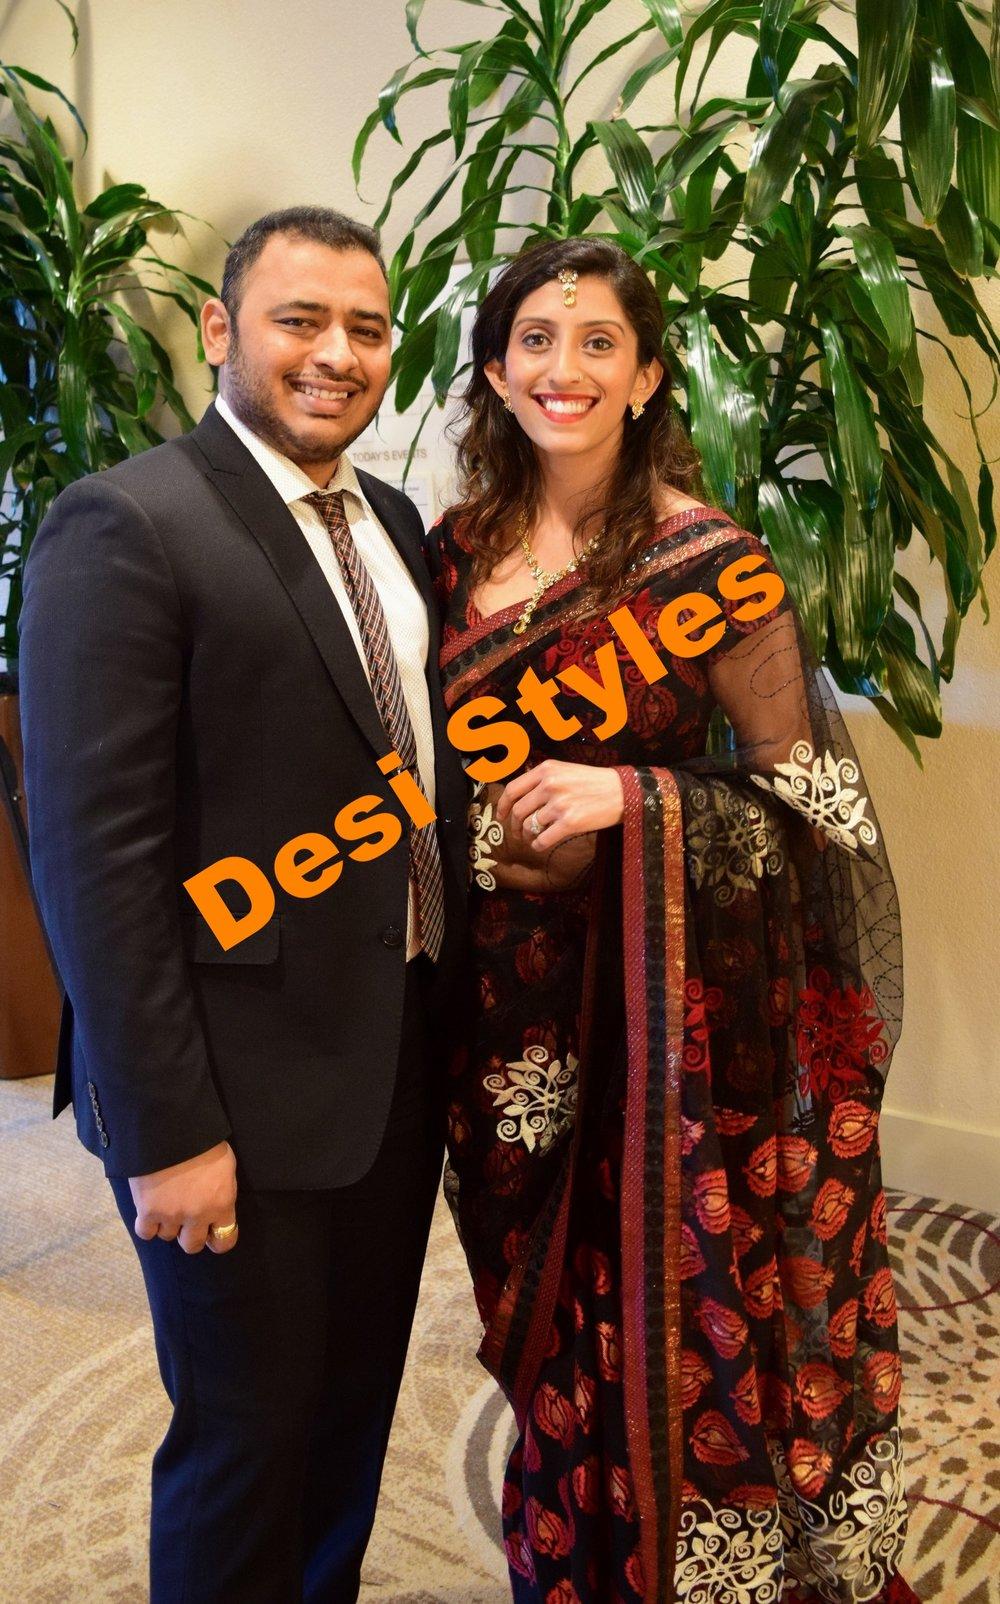 Desi Fashions